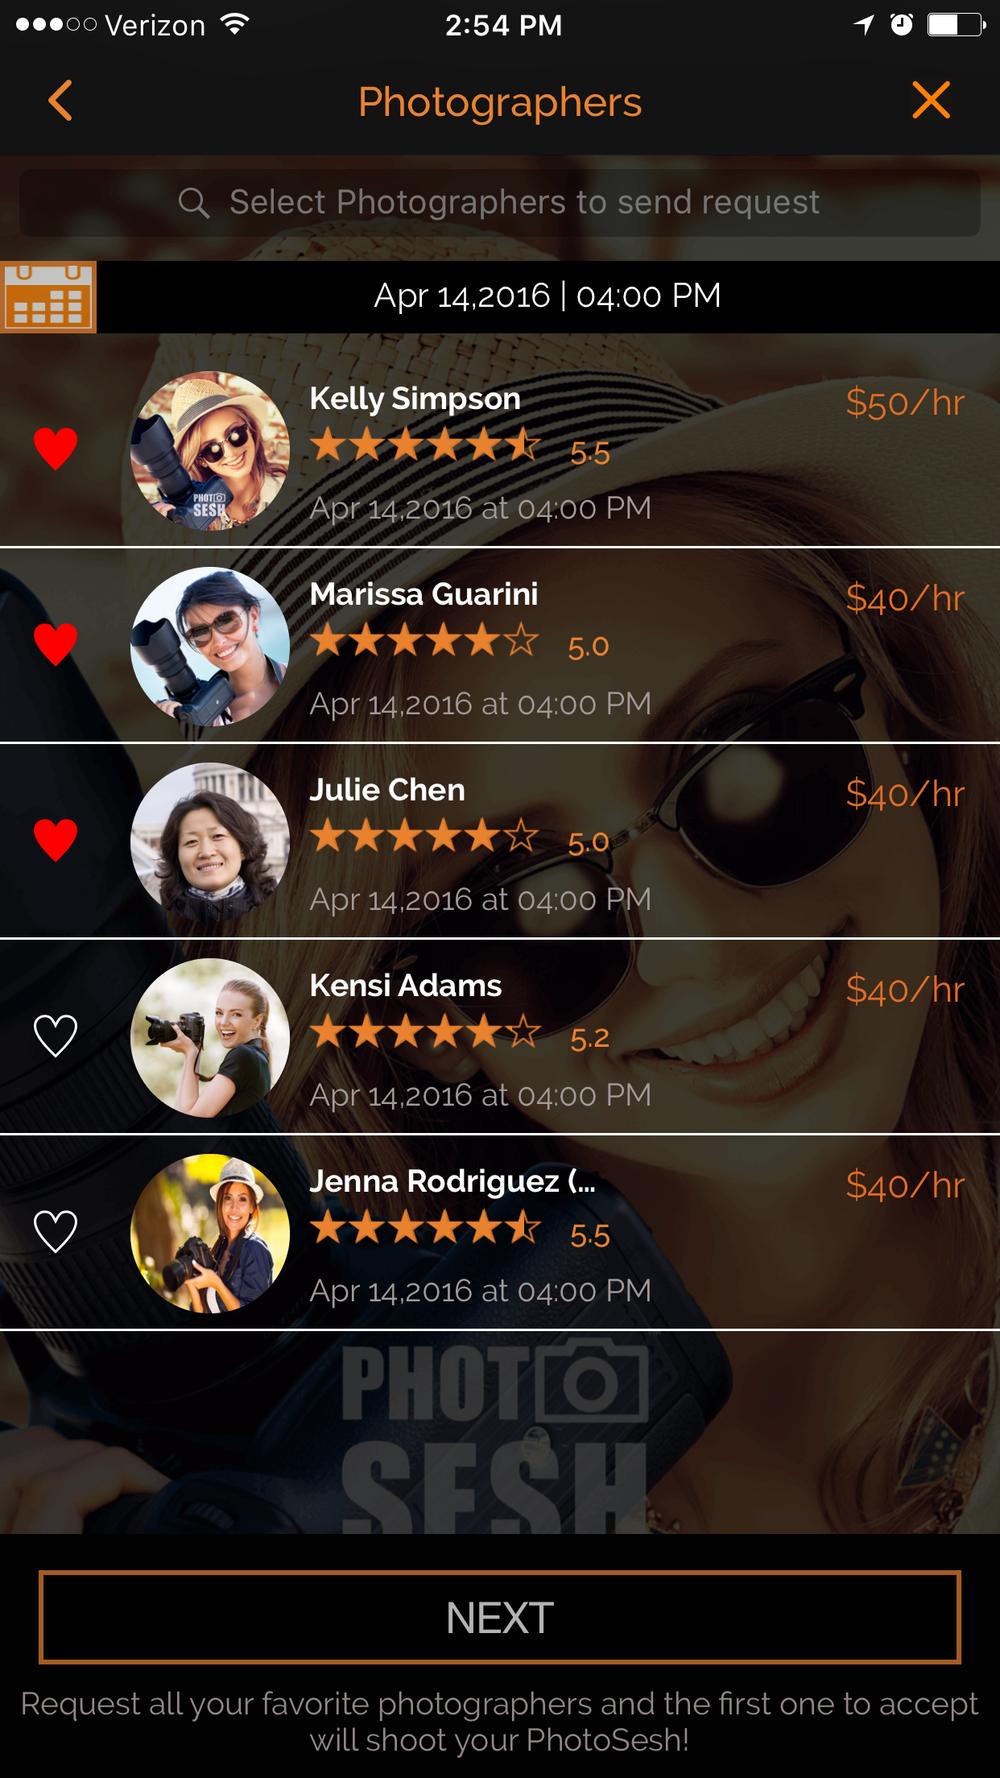 CP Appstore Screenshot - 4.PNG